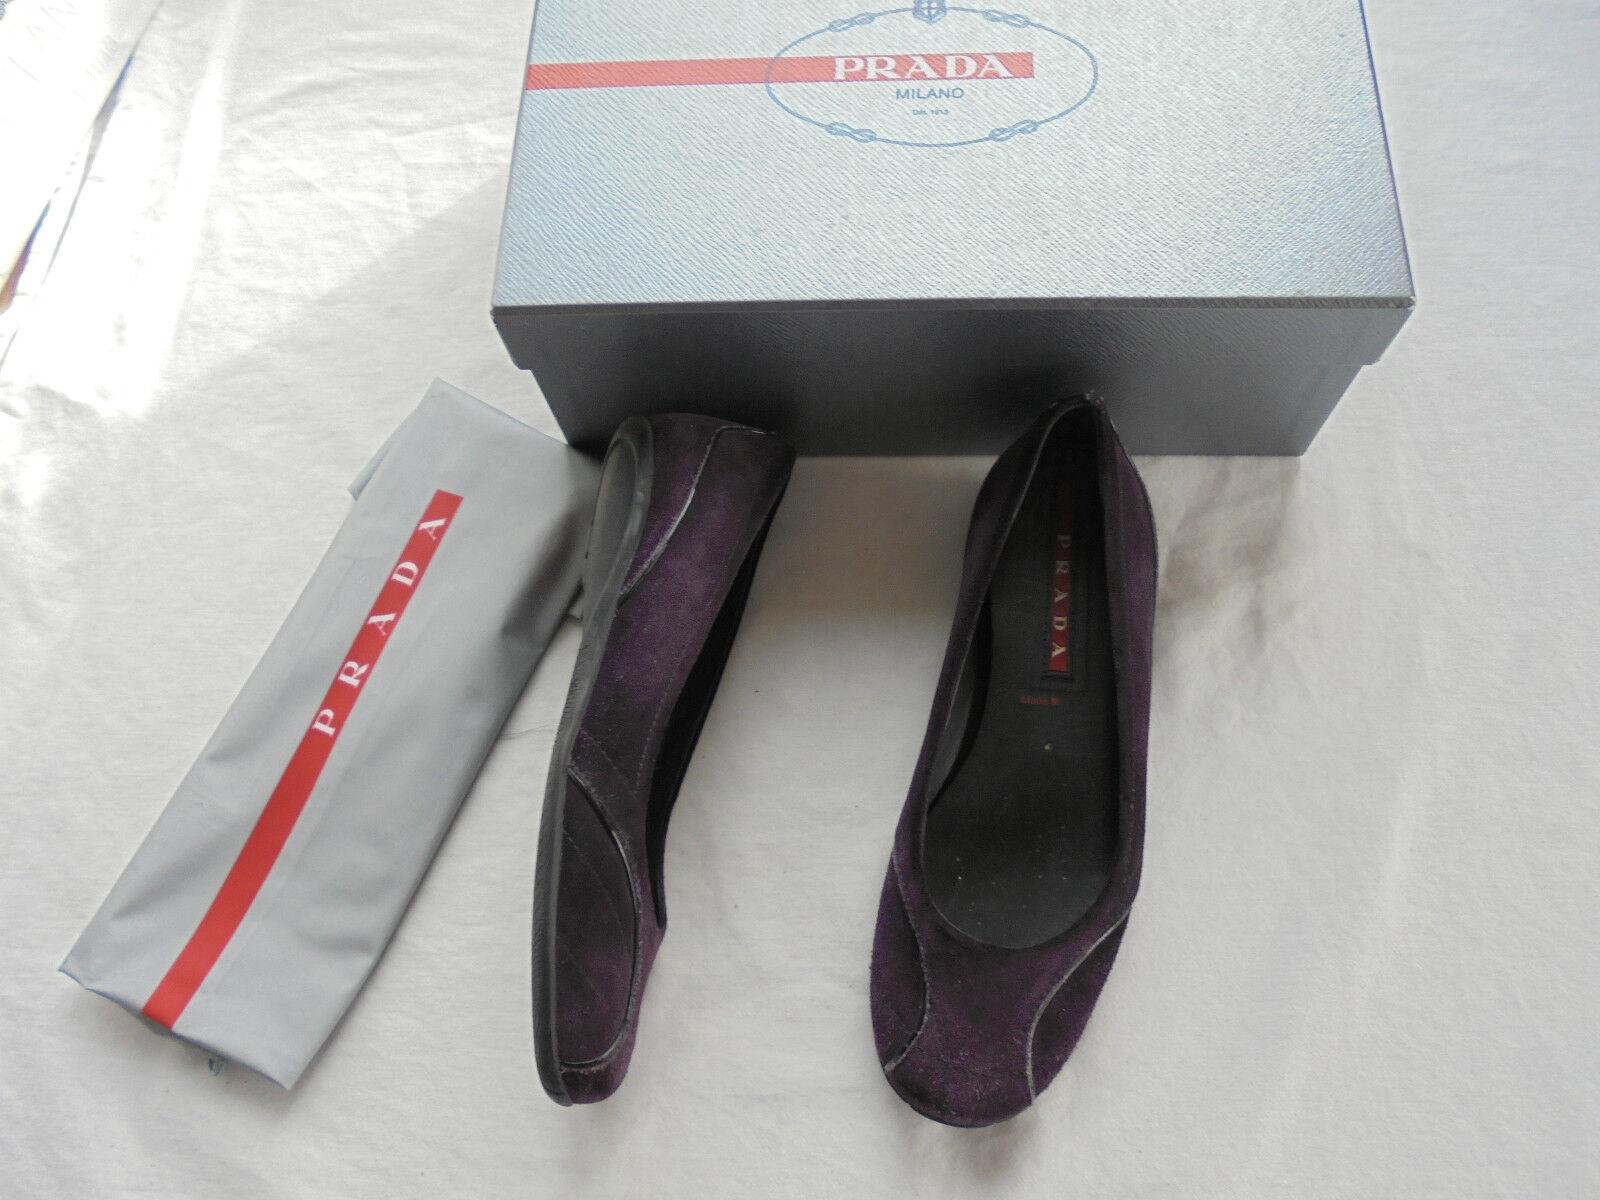 Prada TOP Wildleder Ballerinas NP:  TOP Prada Schuhe Slipper Tasche Pumps Gr. 36 01fc38